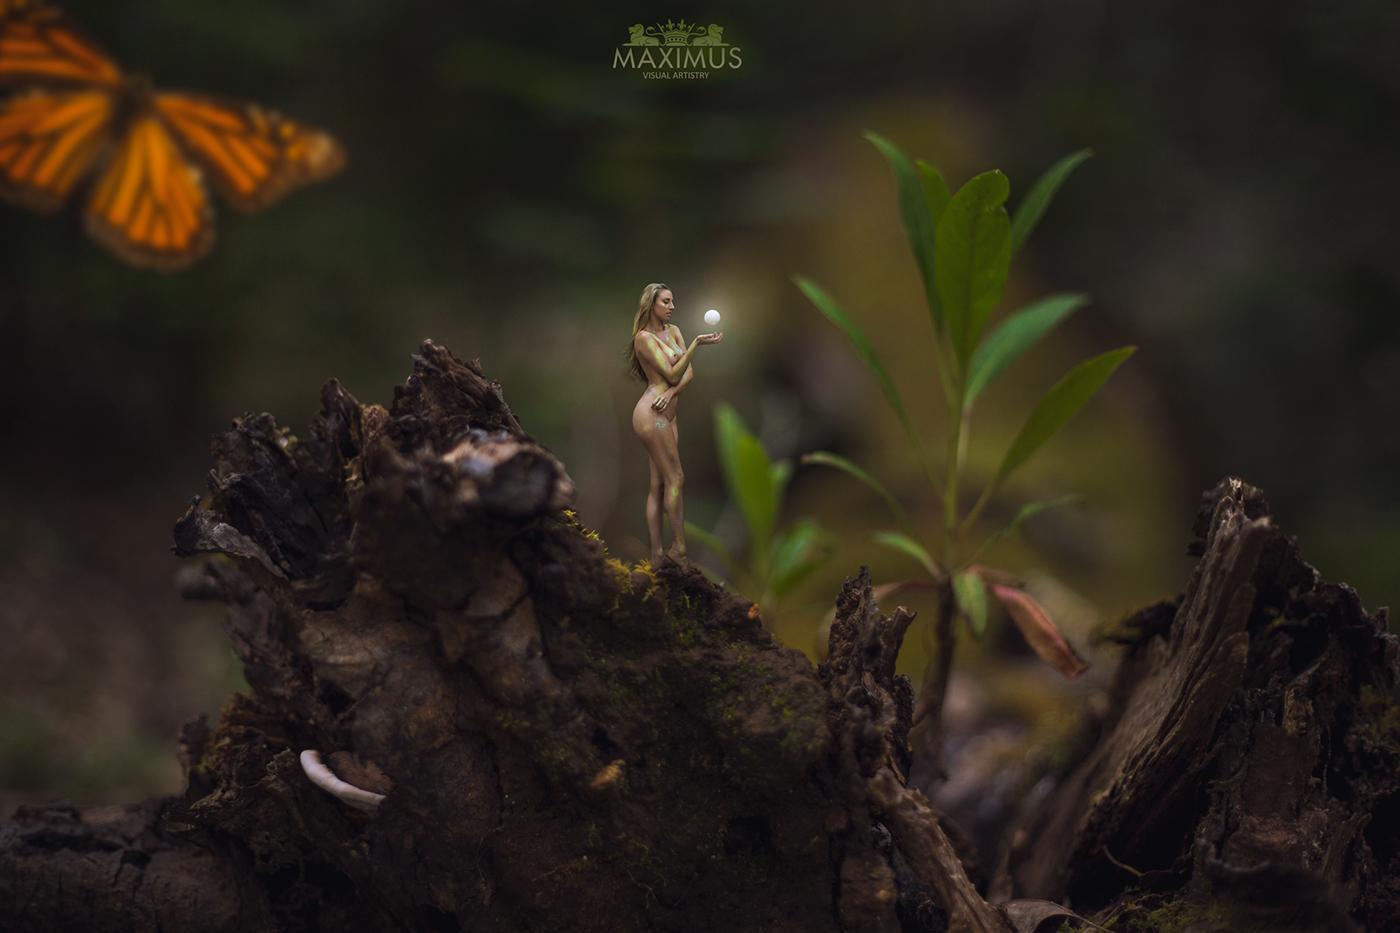 Мечтательница - The Day dreamer / Maximus Parker